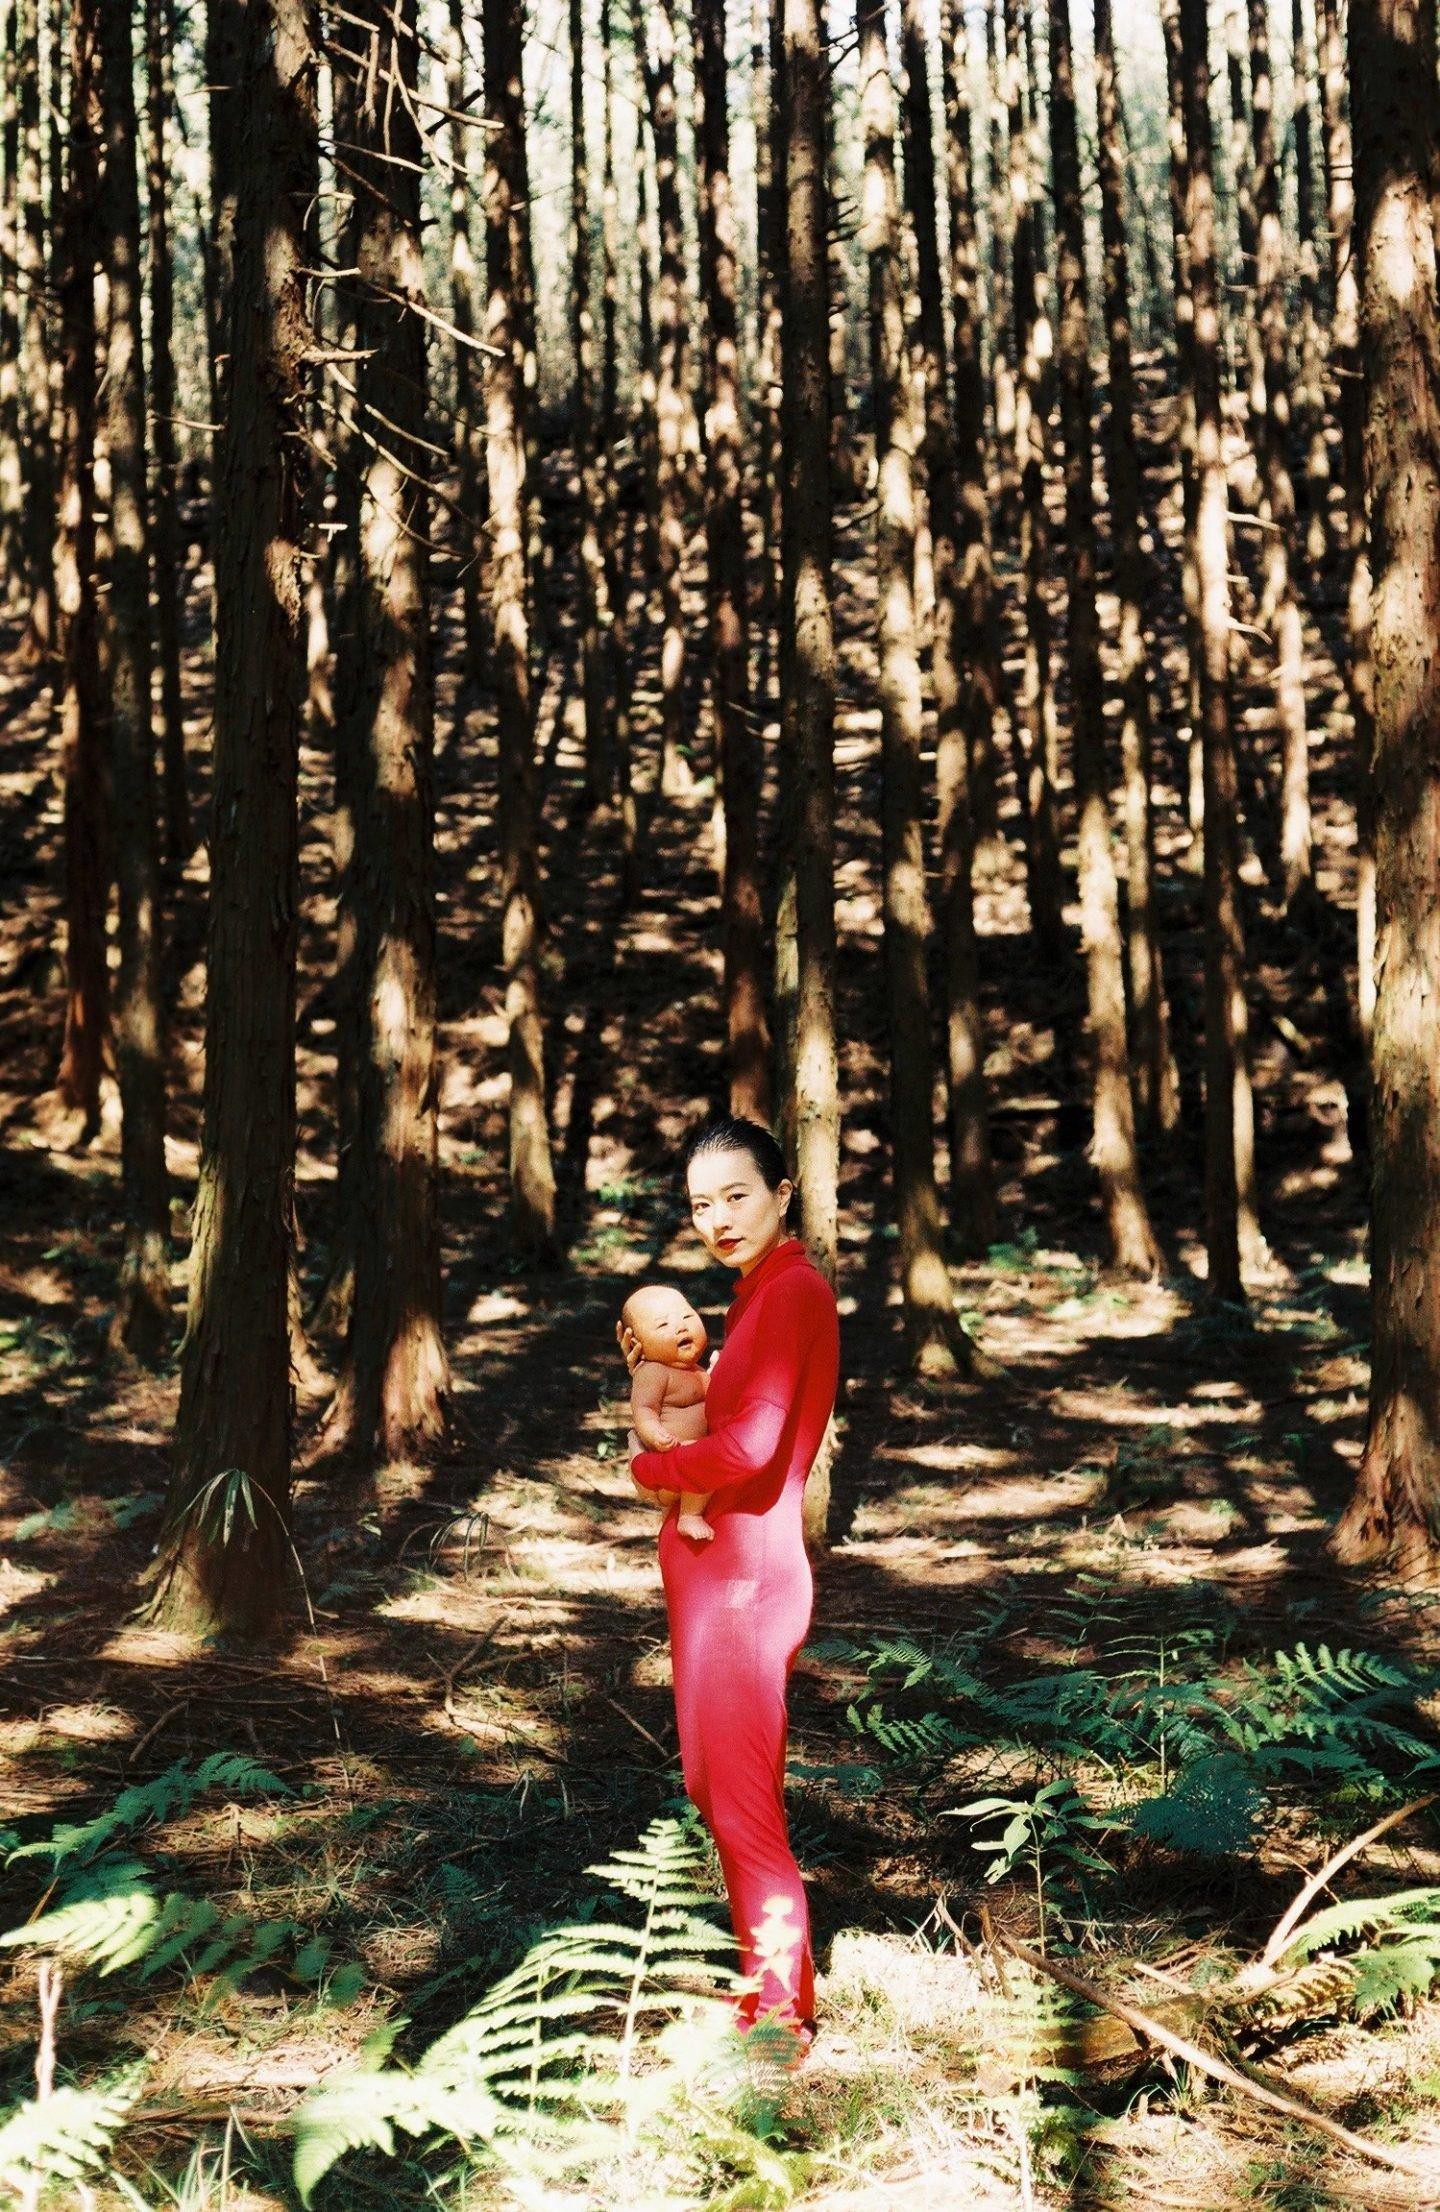 iGNANT-Photography-Yuan-Yao-Nami-5